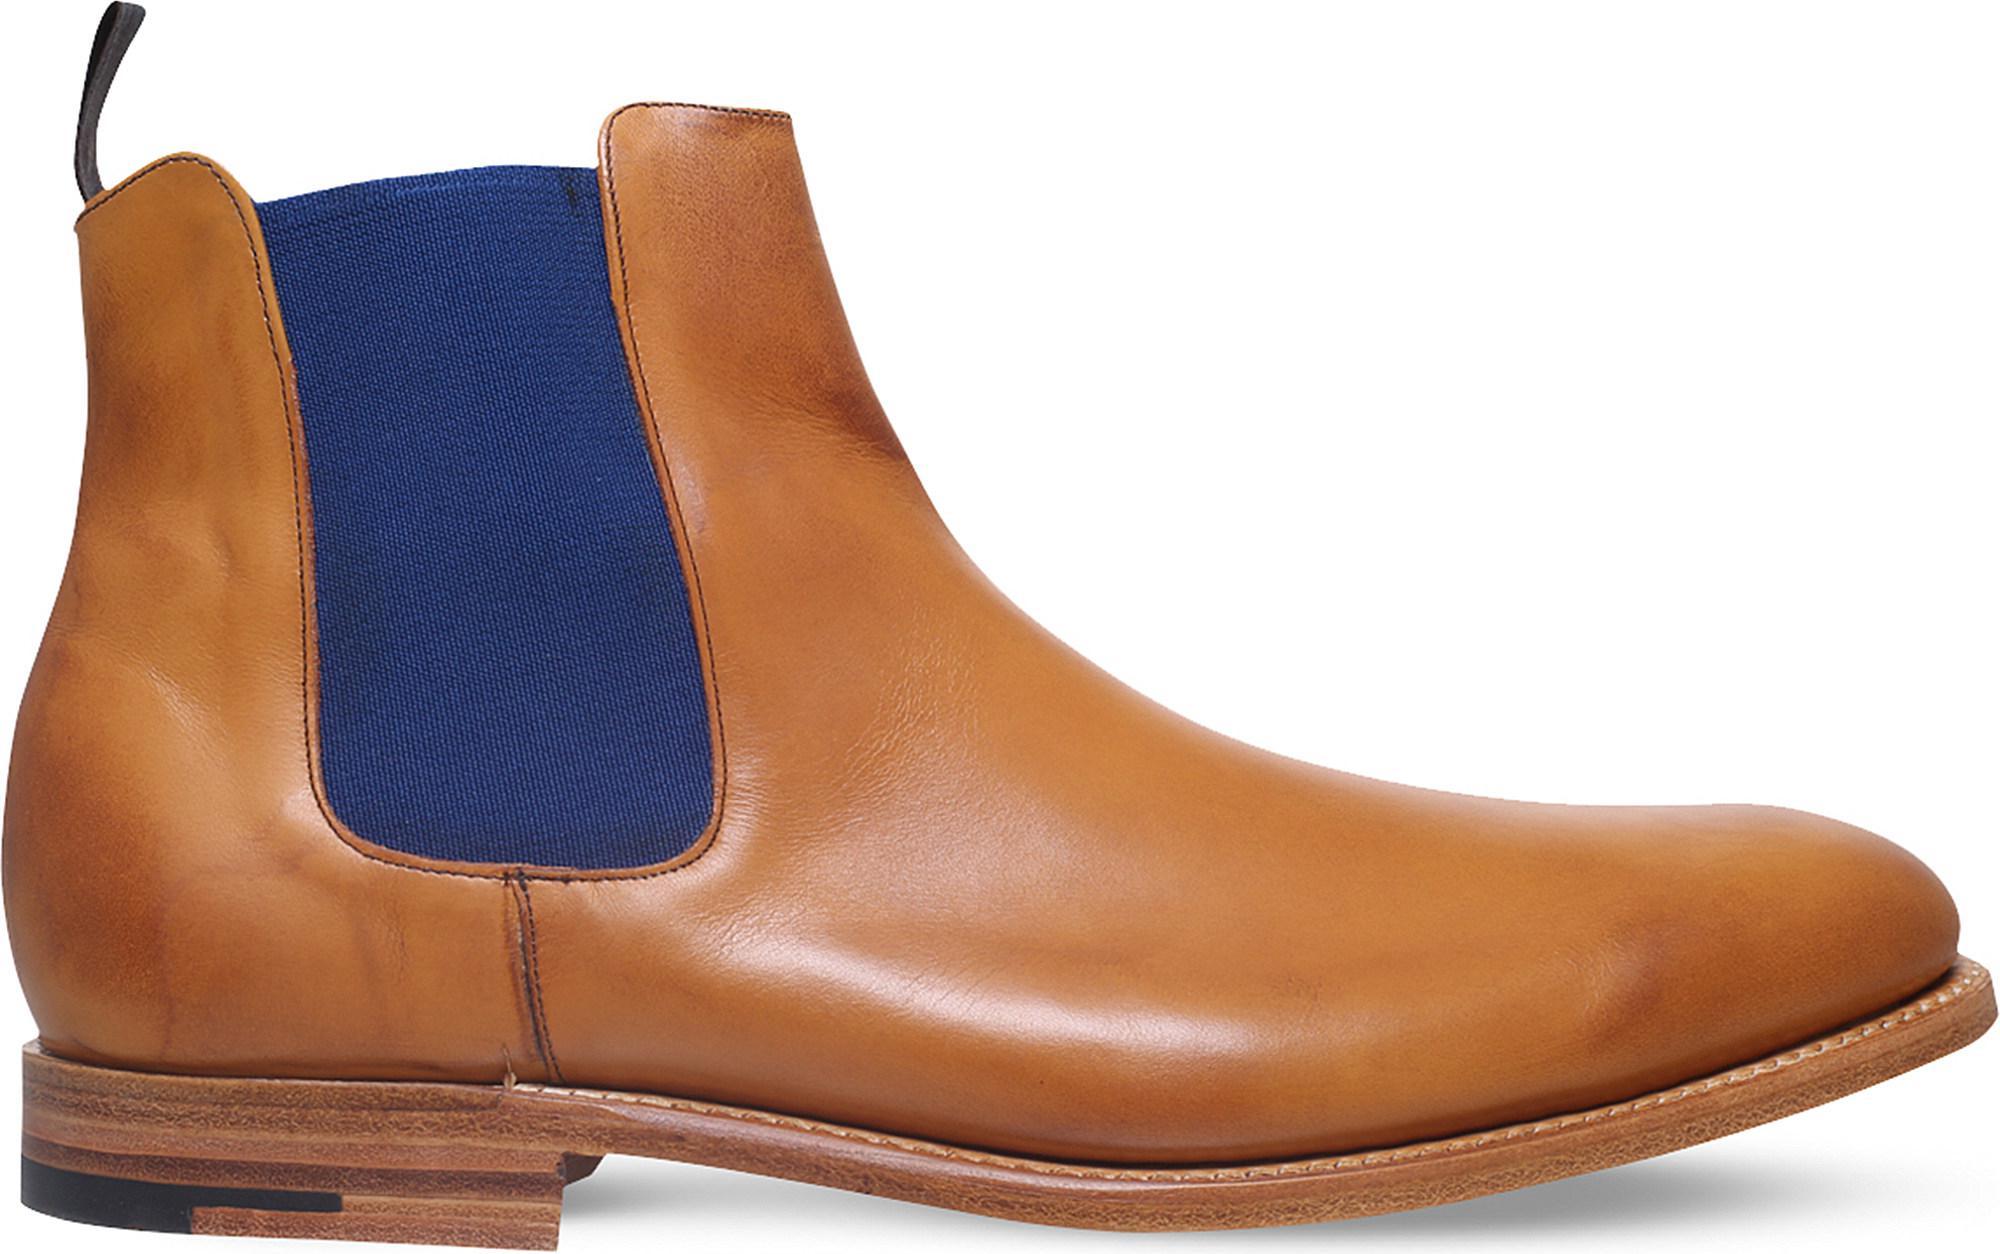 ef82f374a70 Barker - Brown Hopper Leather Chelsea Boots for Men - Lyst